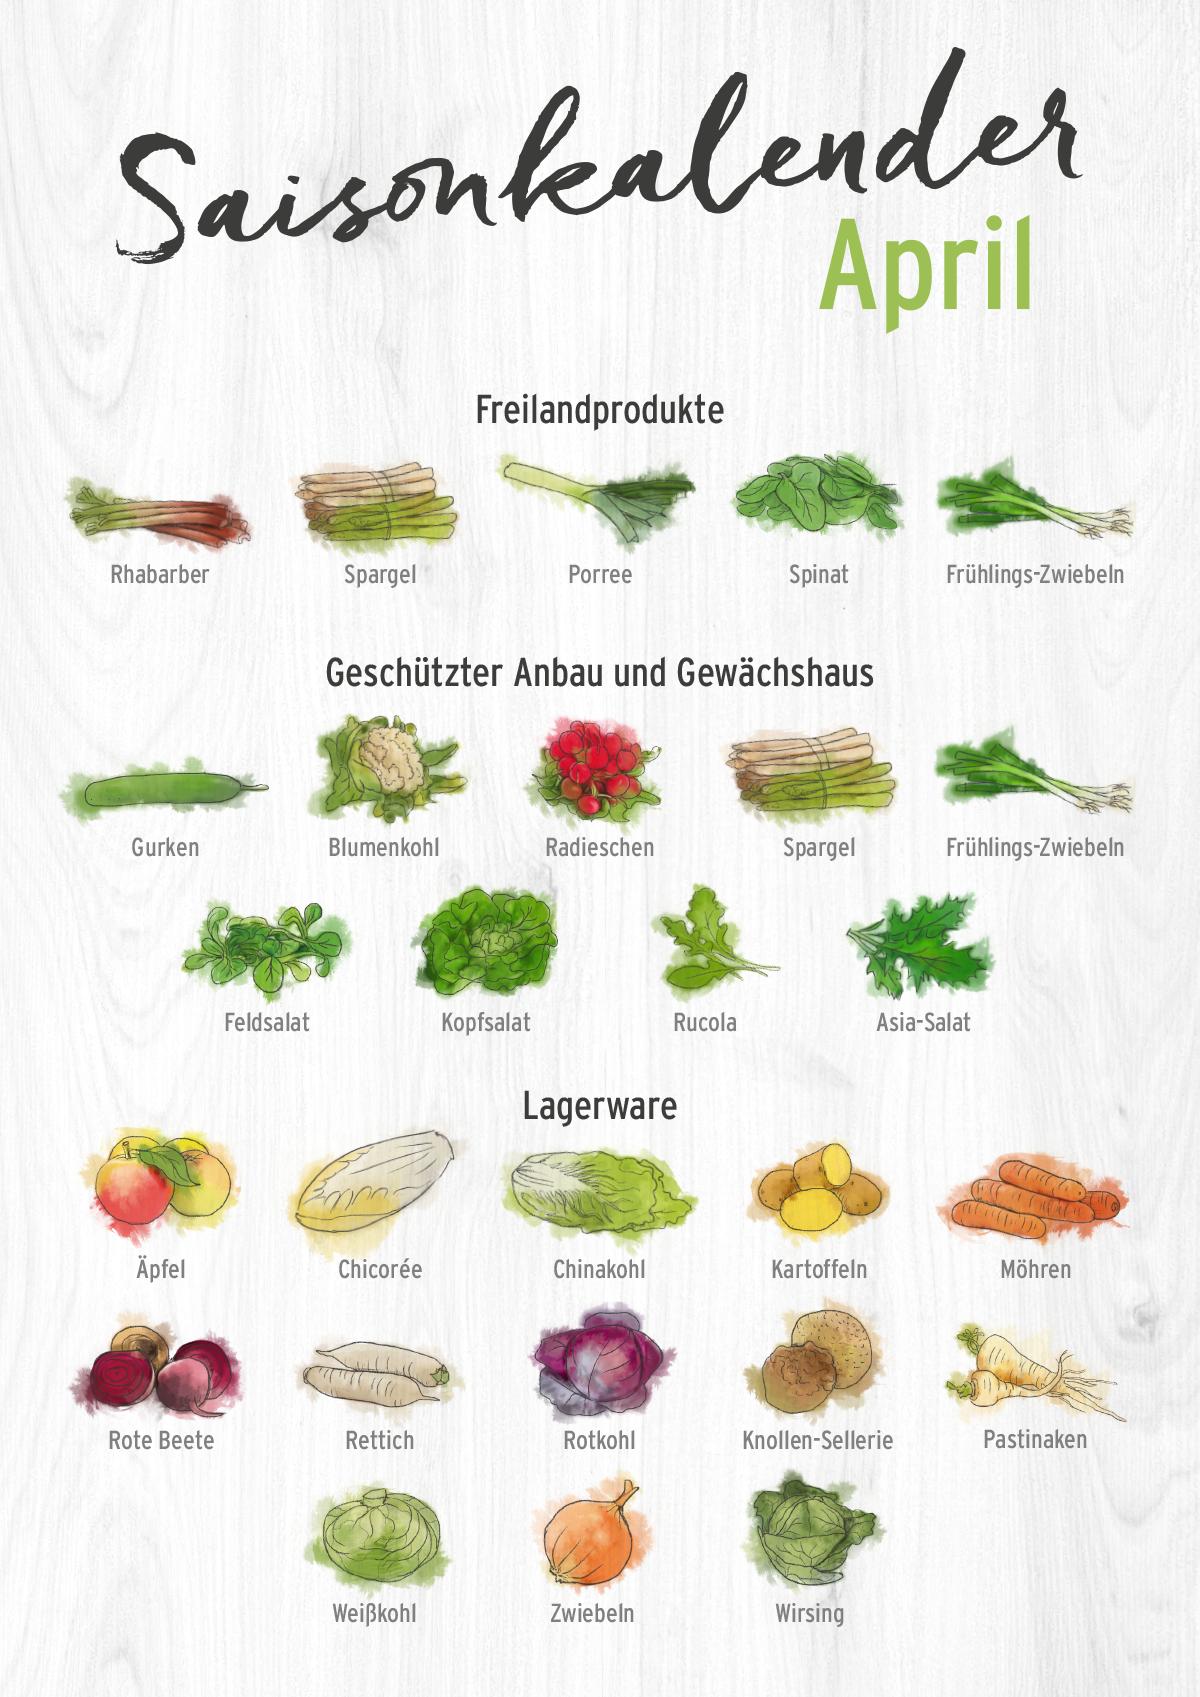 Saisonkalender April Saisonkalender Obst Und Gemuse Saisonkalender Saisonkalender Gemuse